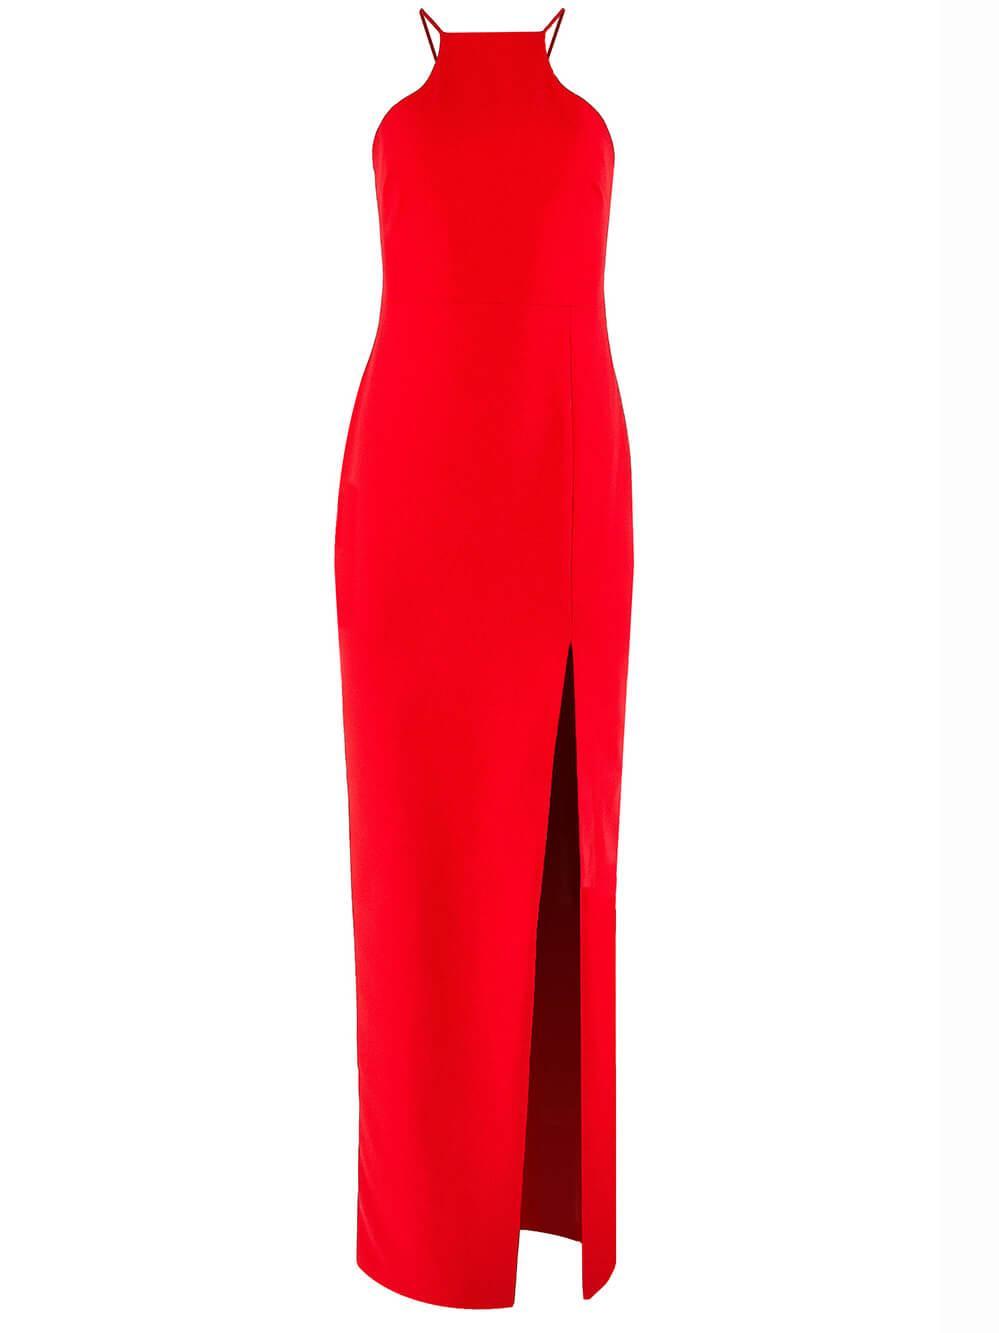 Rocco Halter Neck Gown Item # YD1026001LYB-C